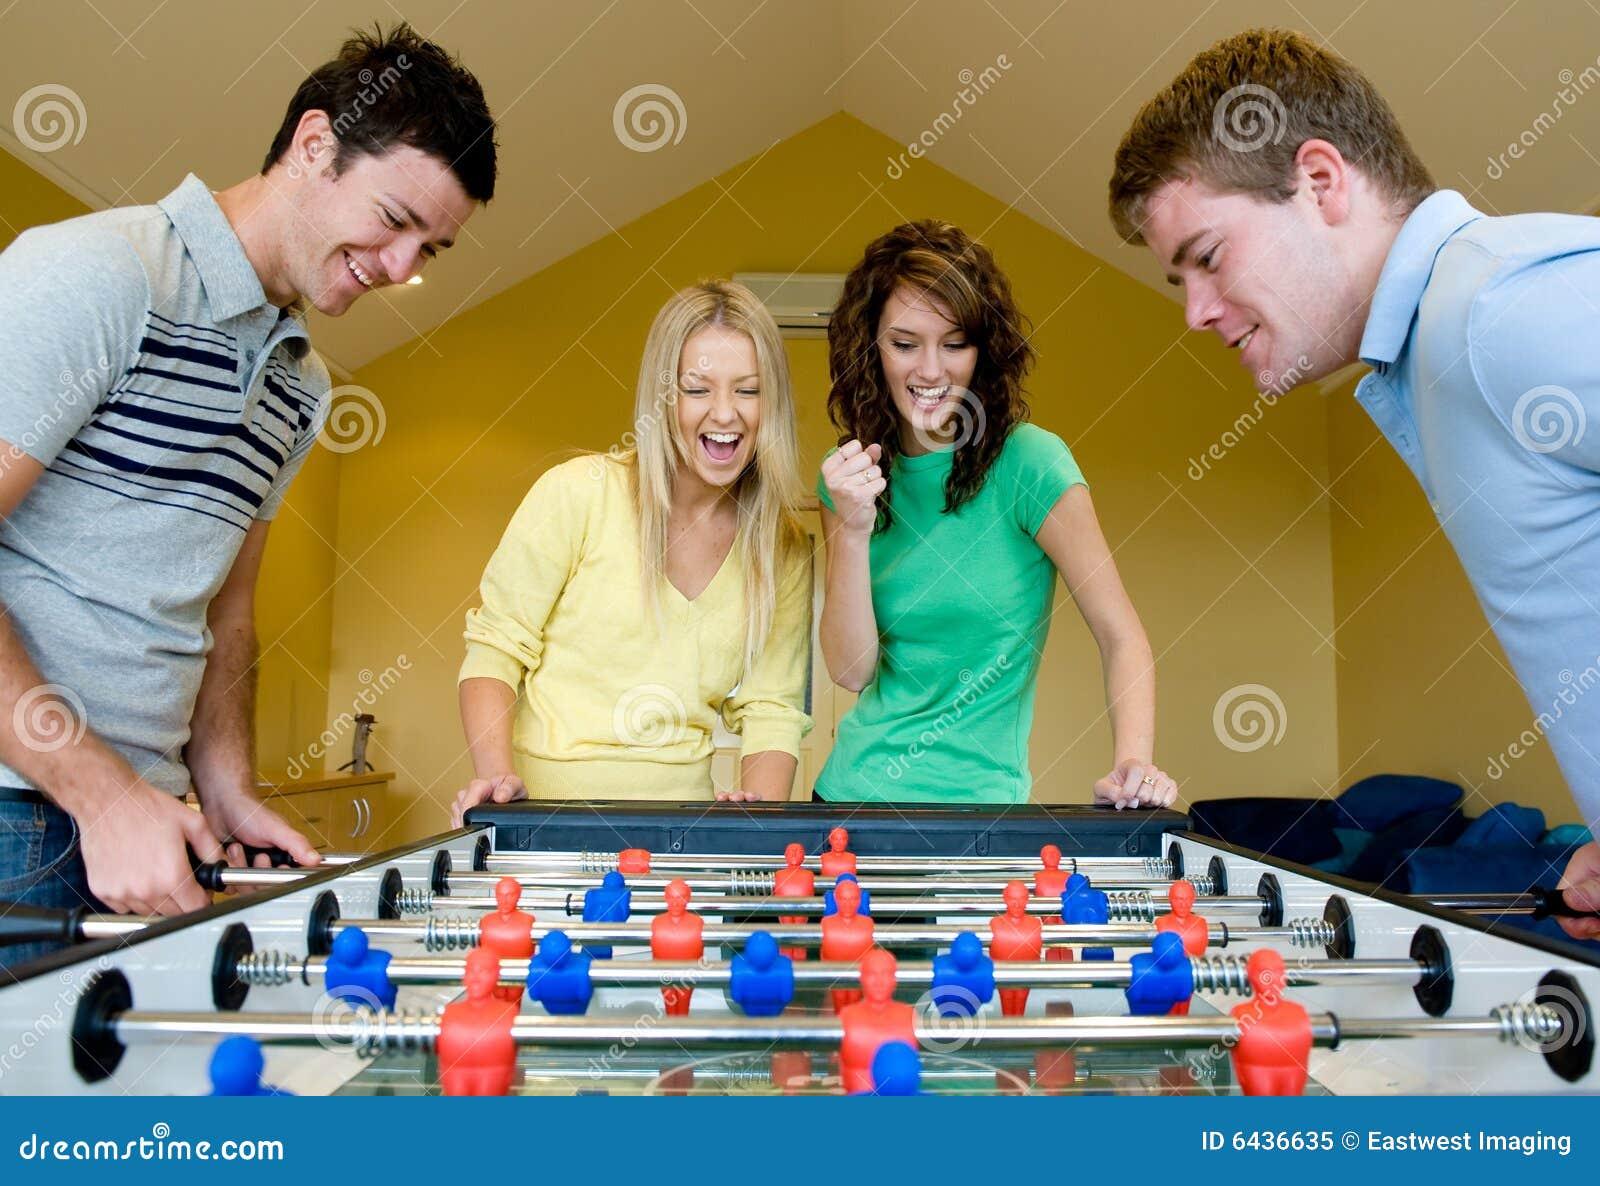 Jouer au football de Tableau